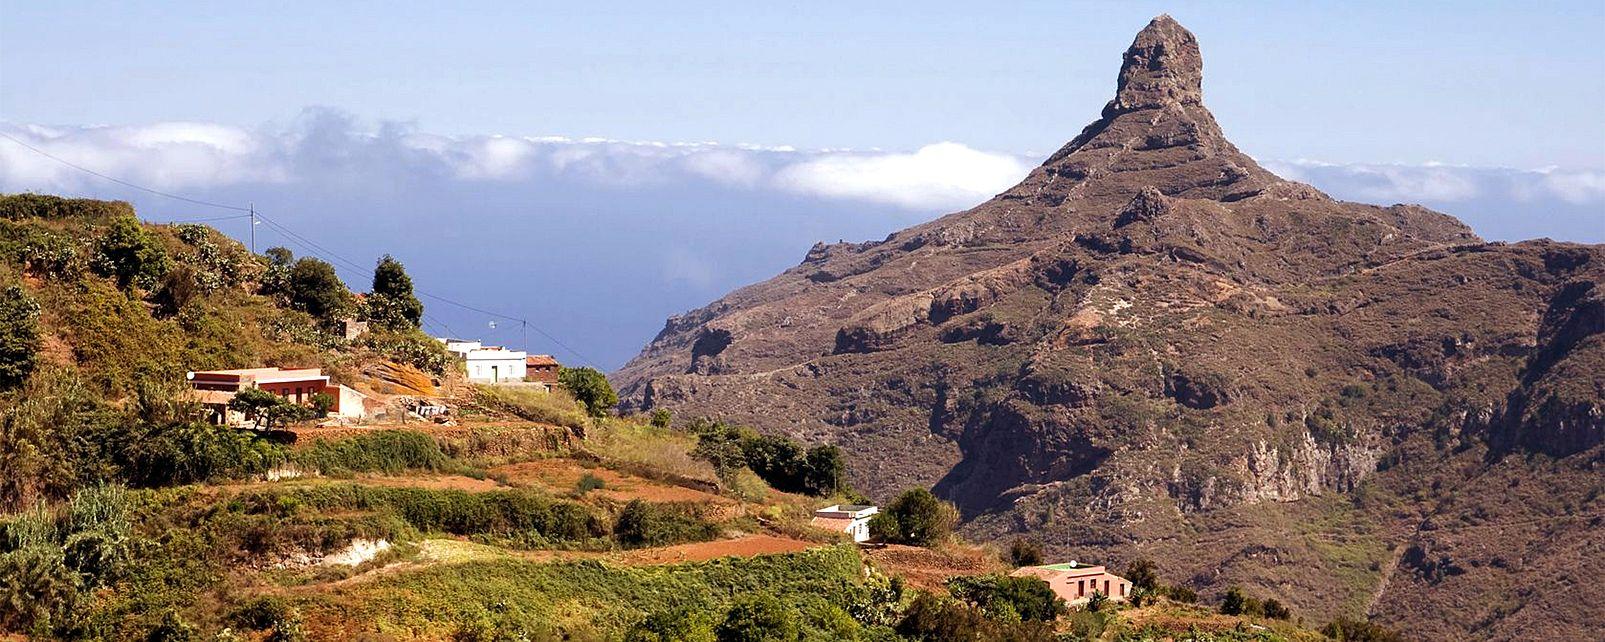 La faune et la flore, Cruz de Taborno, taborno, ténérife, canaries, île, mer, espagne, parc, anaga